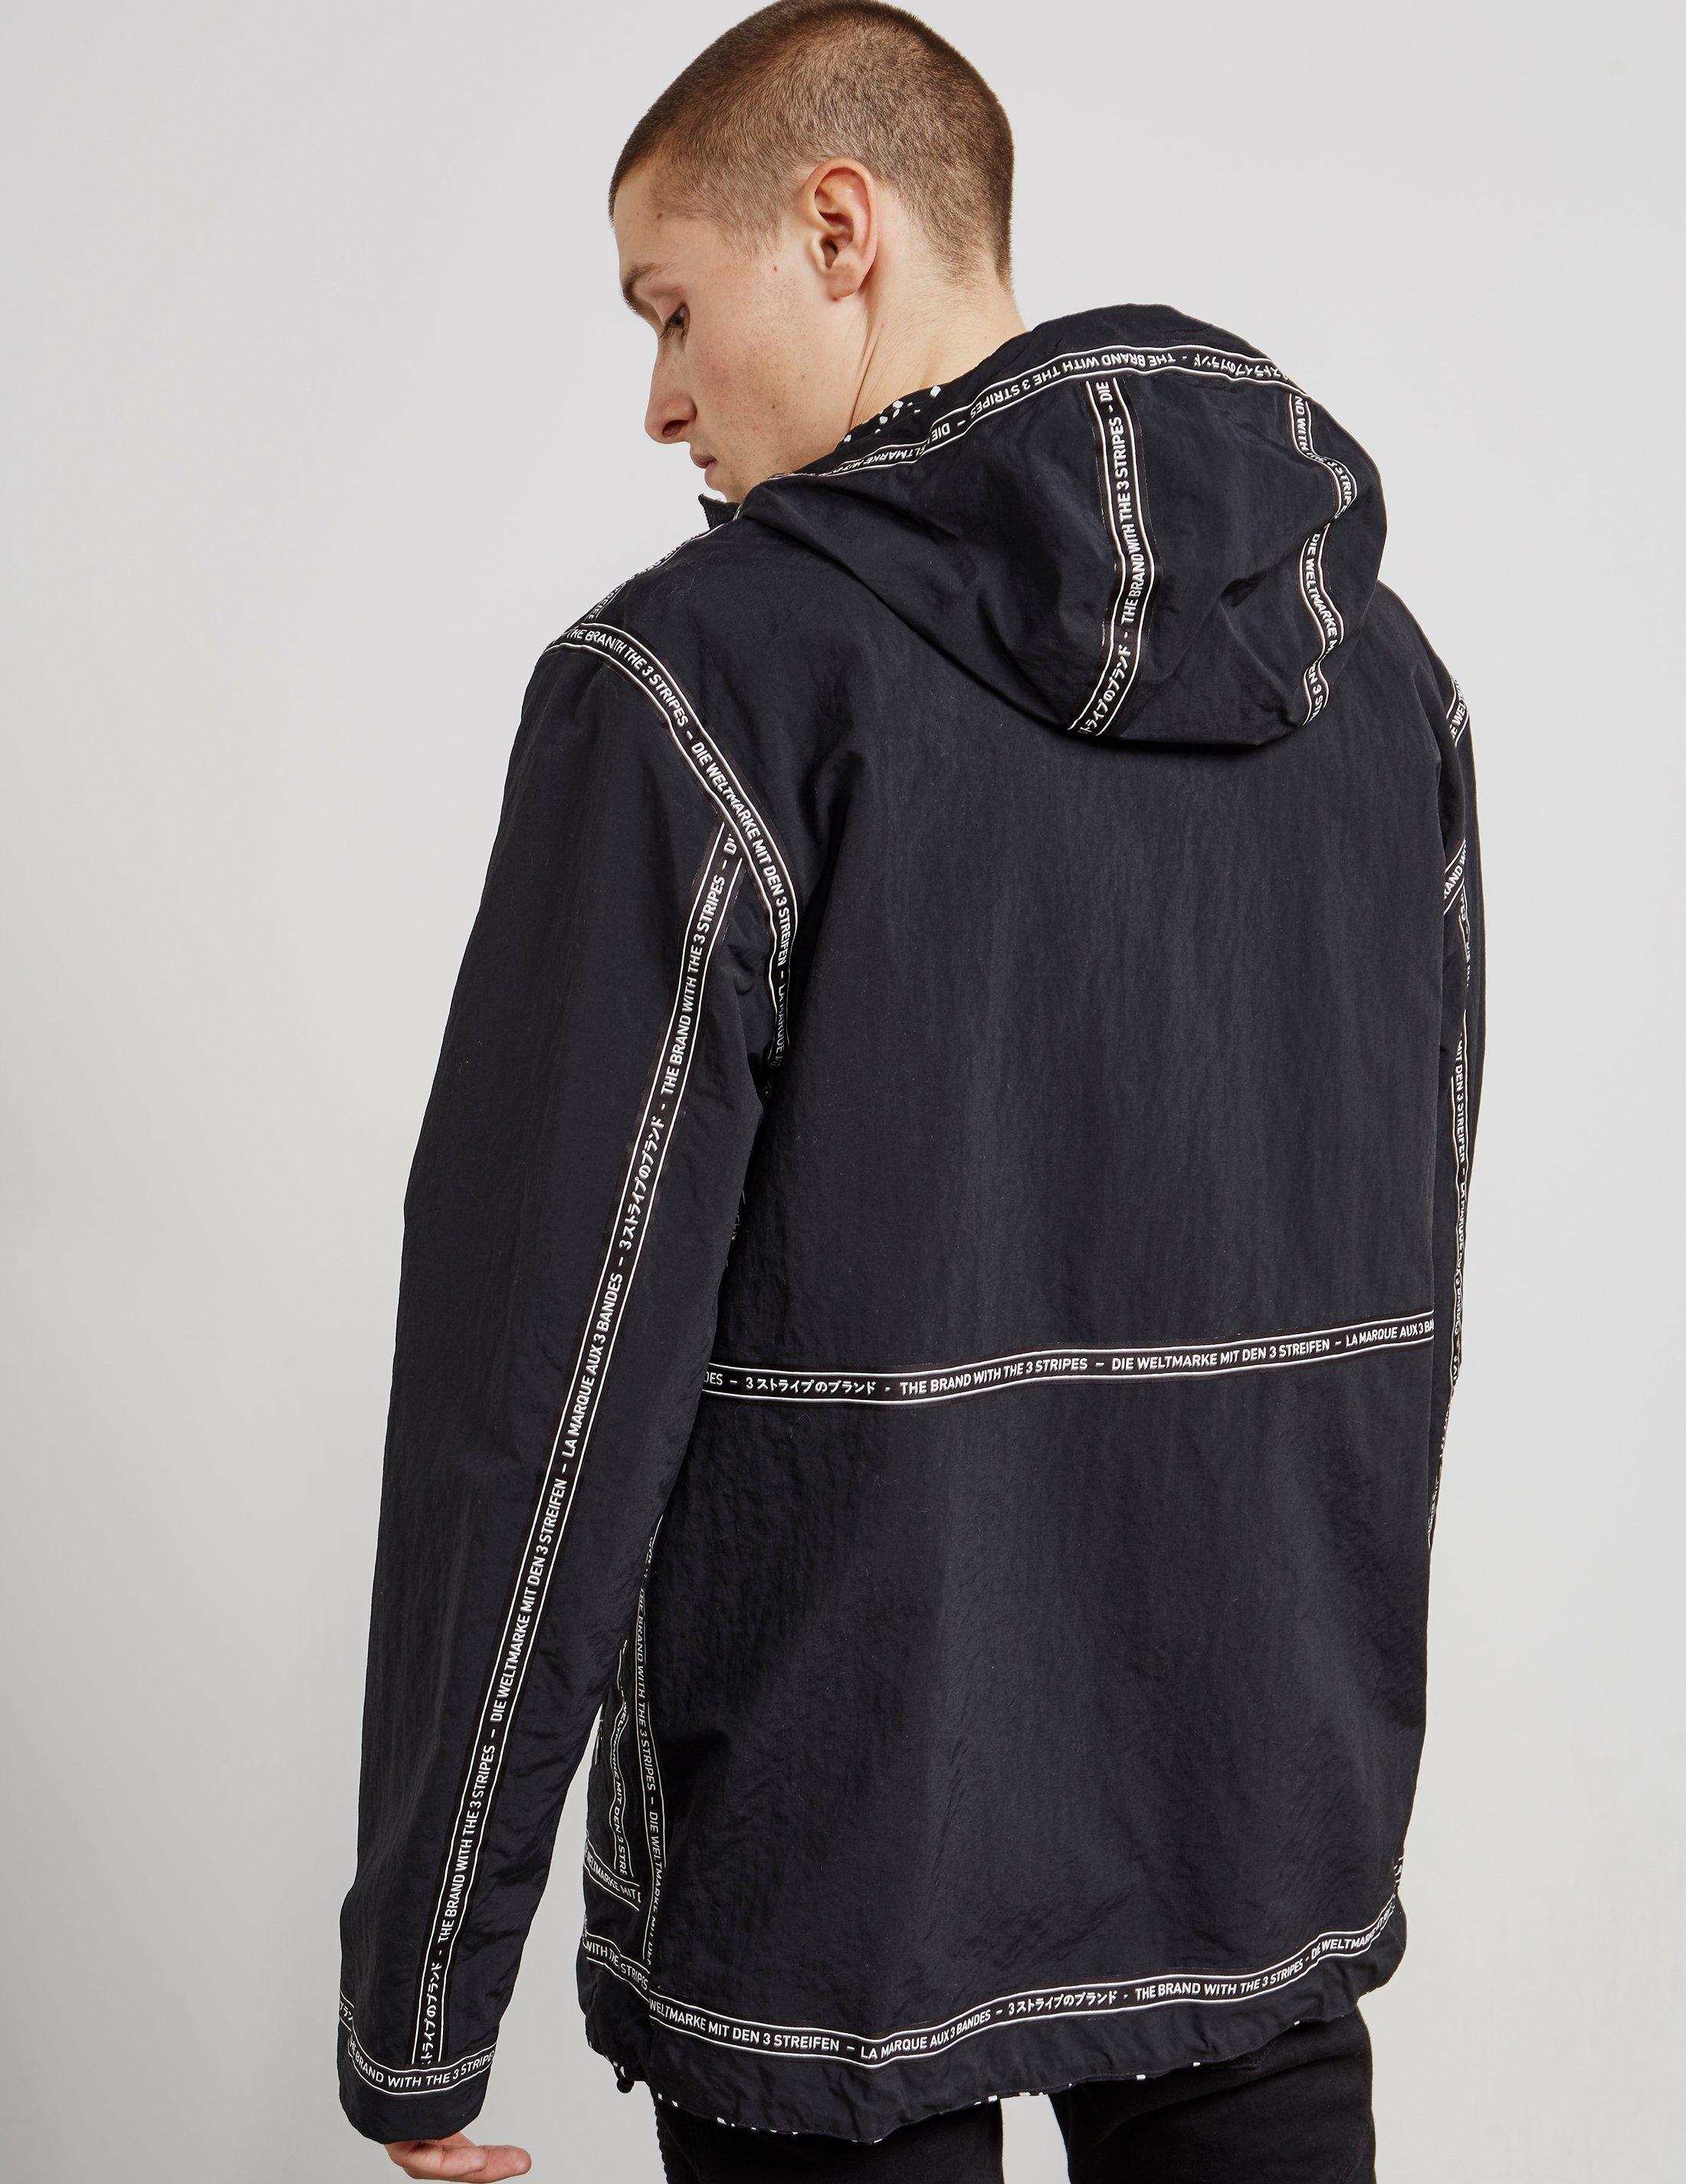 575eb0babc14 Adidas Originals - Nmd Reversible Lightweight Field Jacket Black for Men -  Lyst. View fullscreen